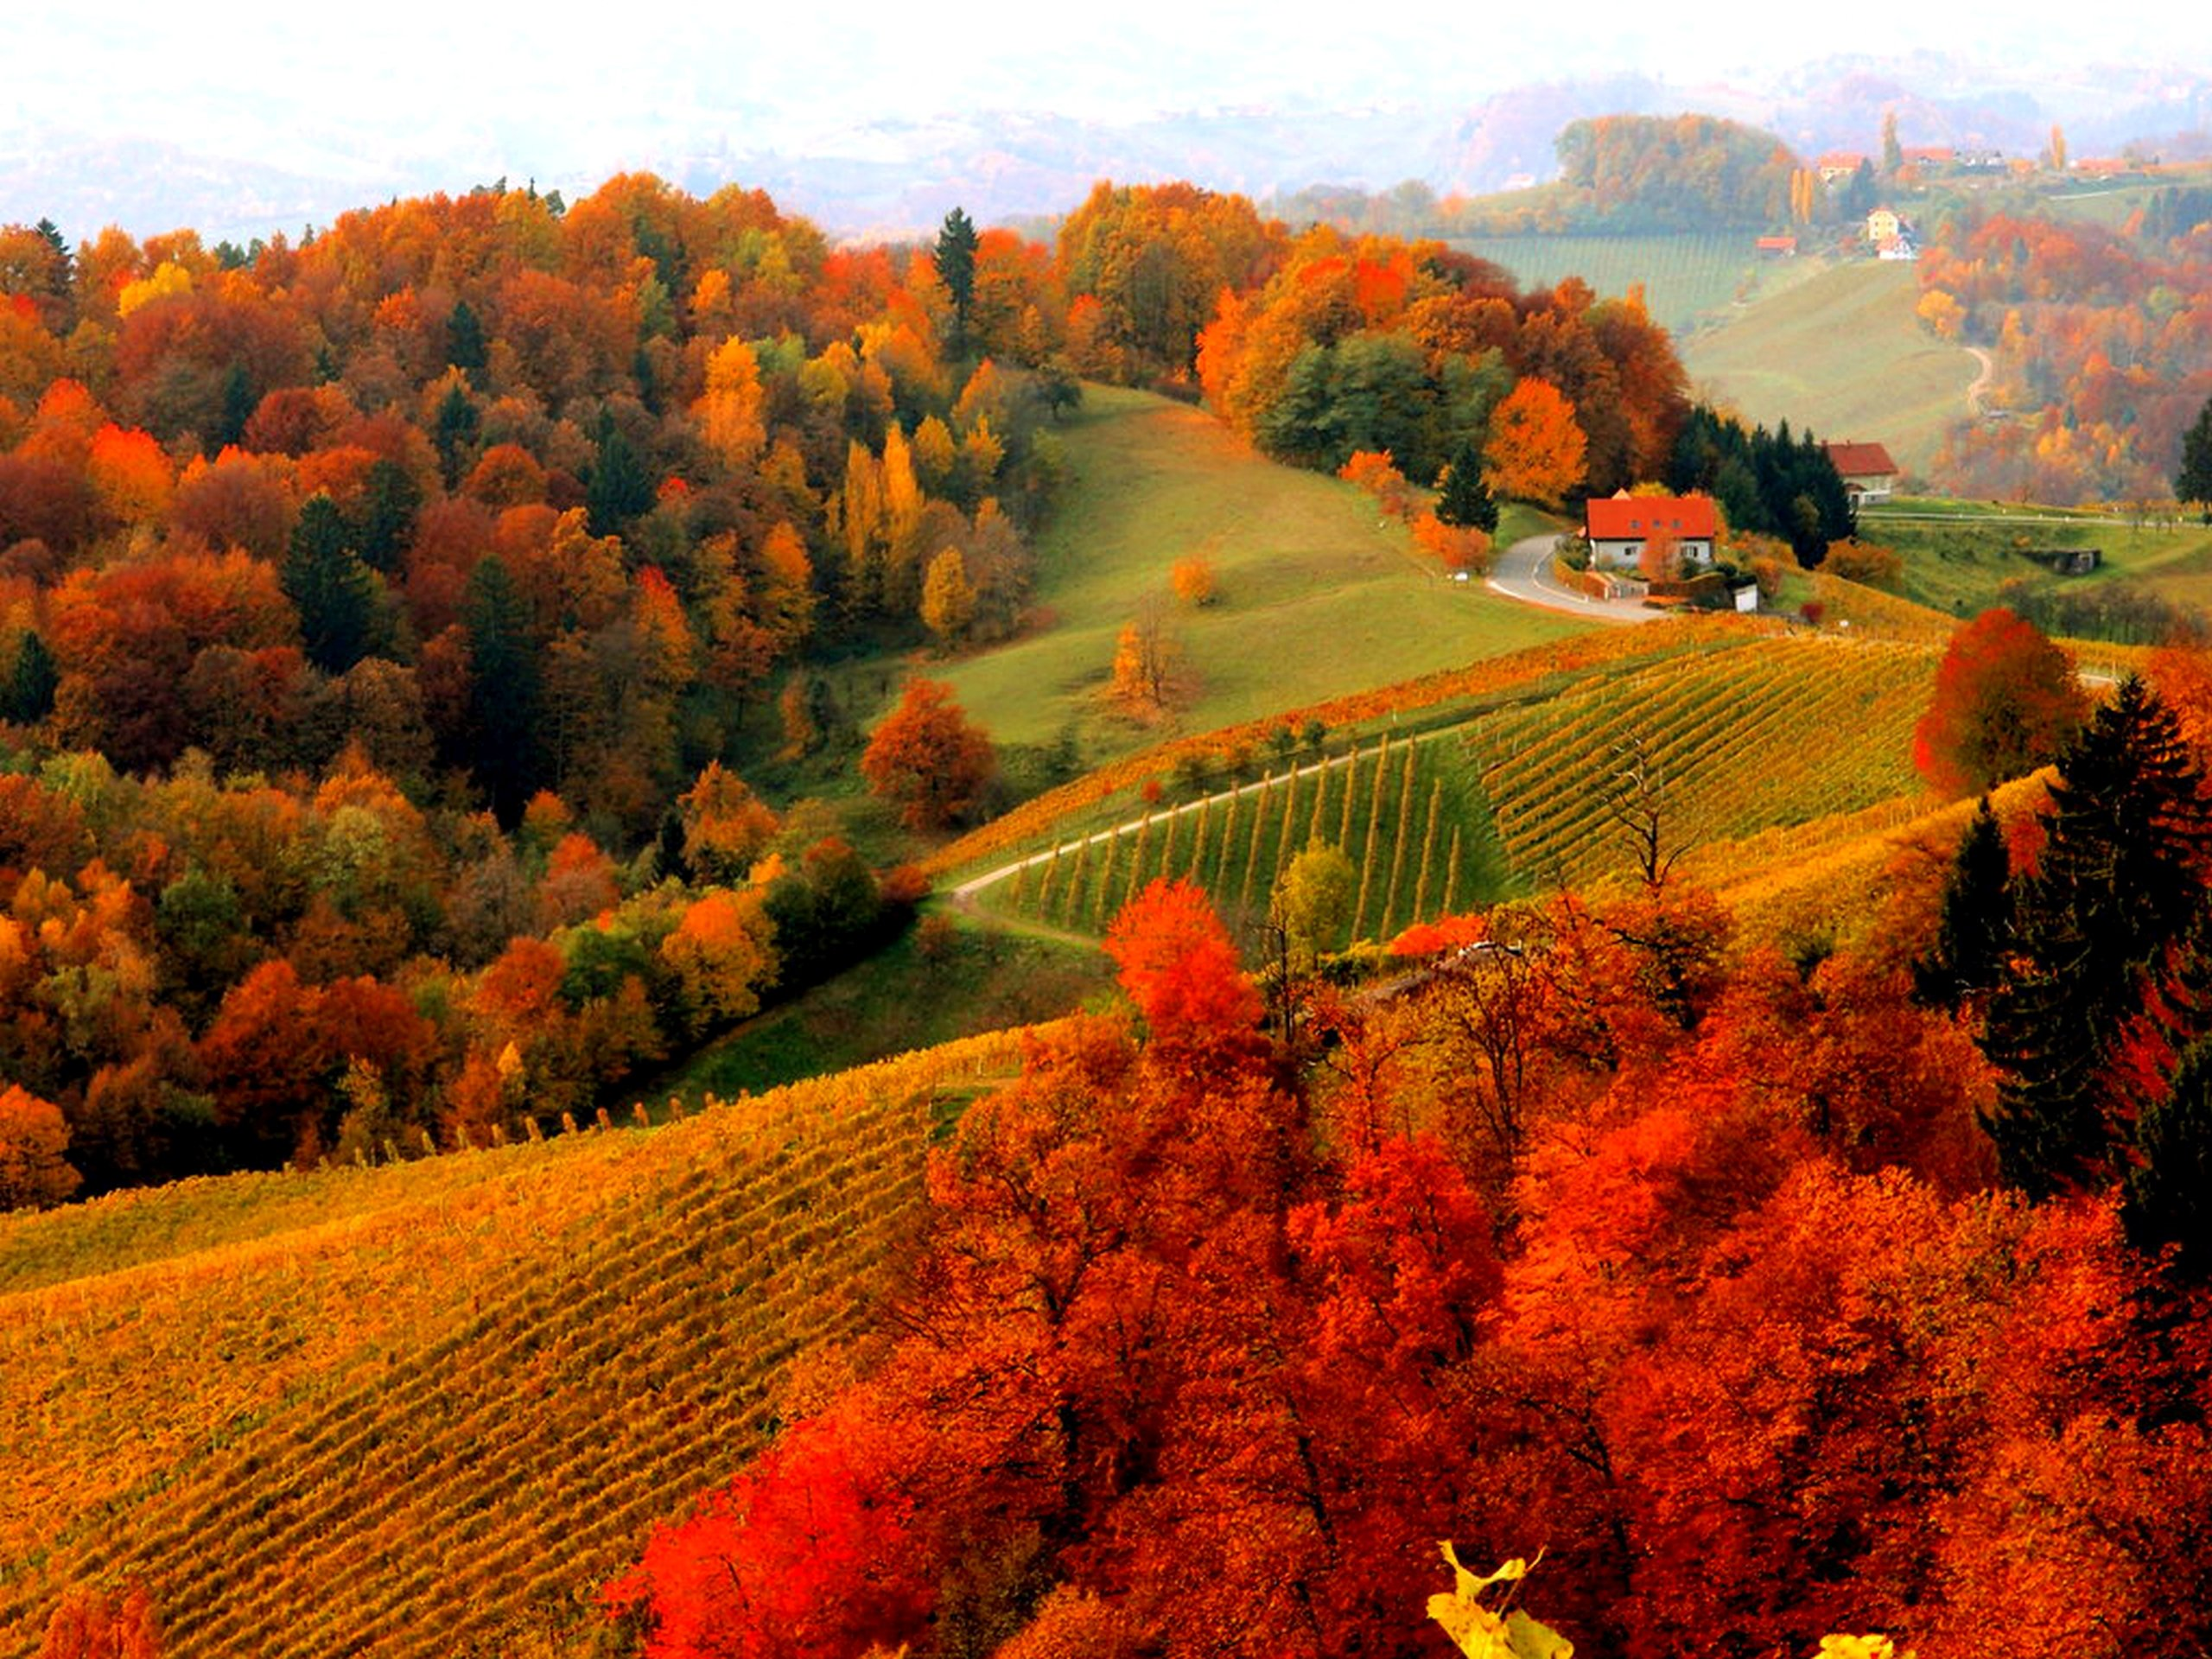 autumn mountains backgrounds.  Autumn Wallpapers ID692063 Intended Autumn Mountains Backgrounds L